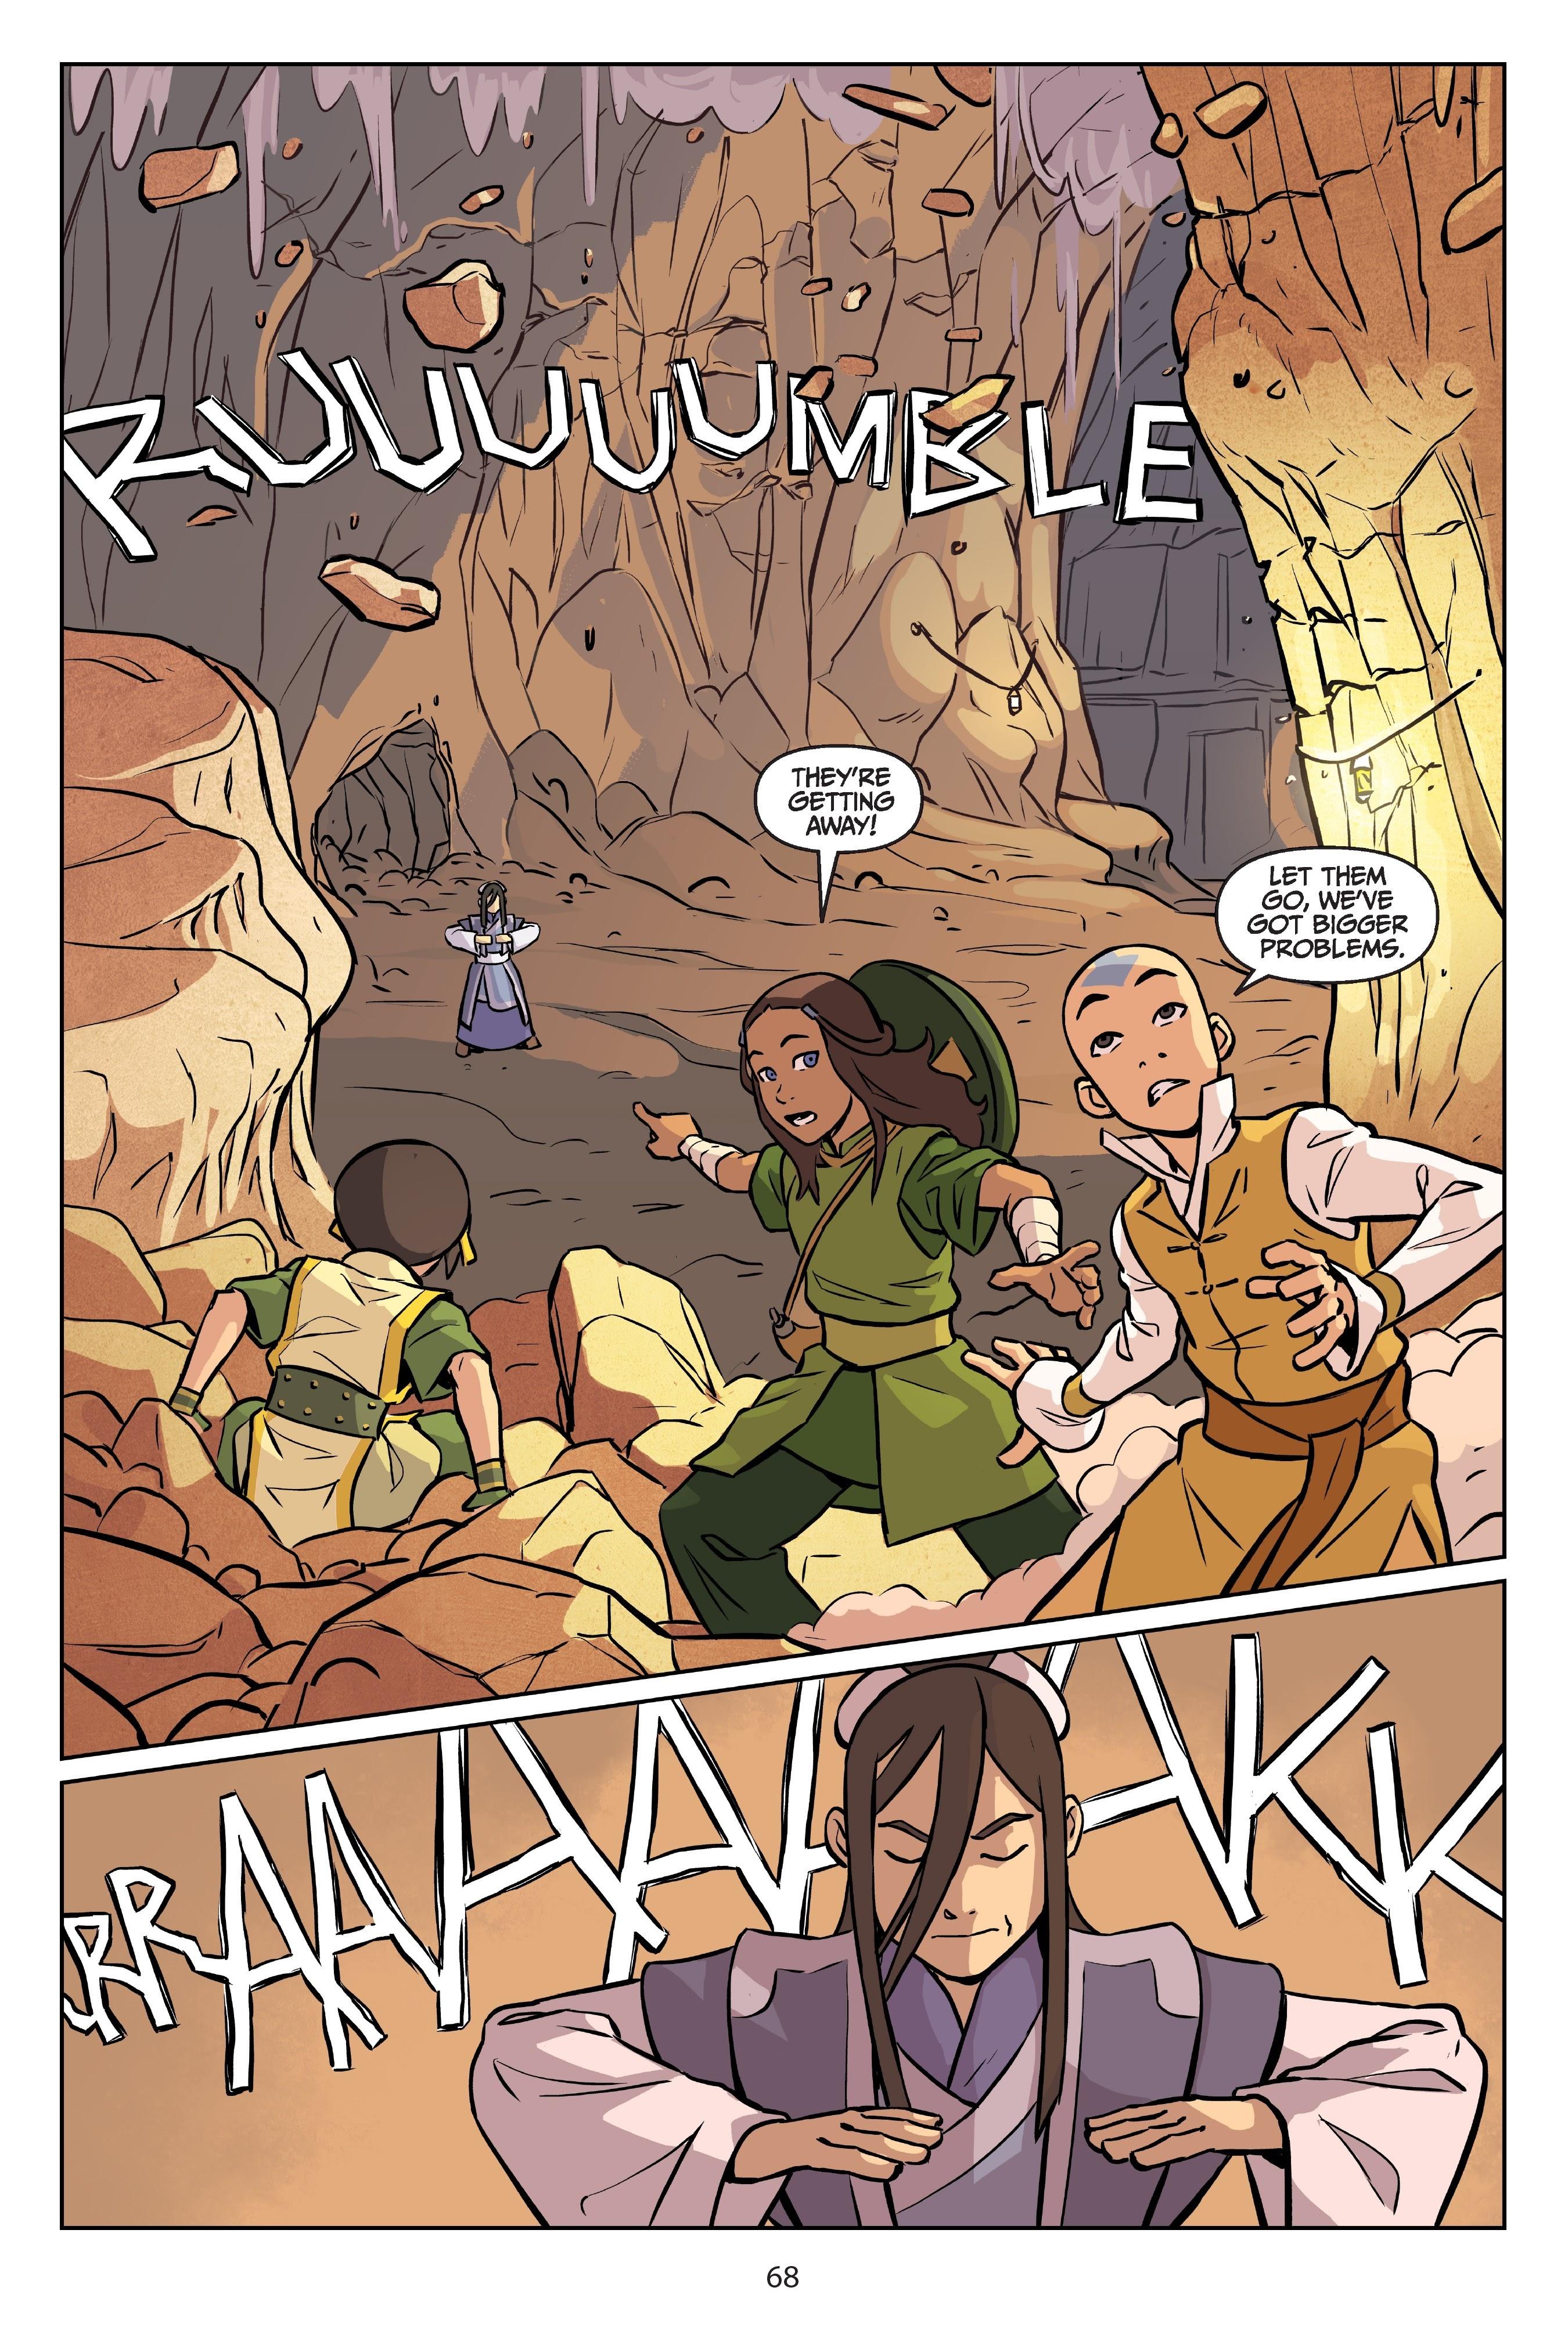 Nickelodeon Avatar: The Last Airbender - Imbalance TPB_2 Page 68